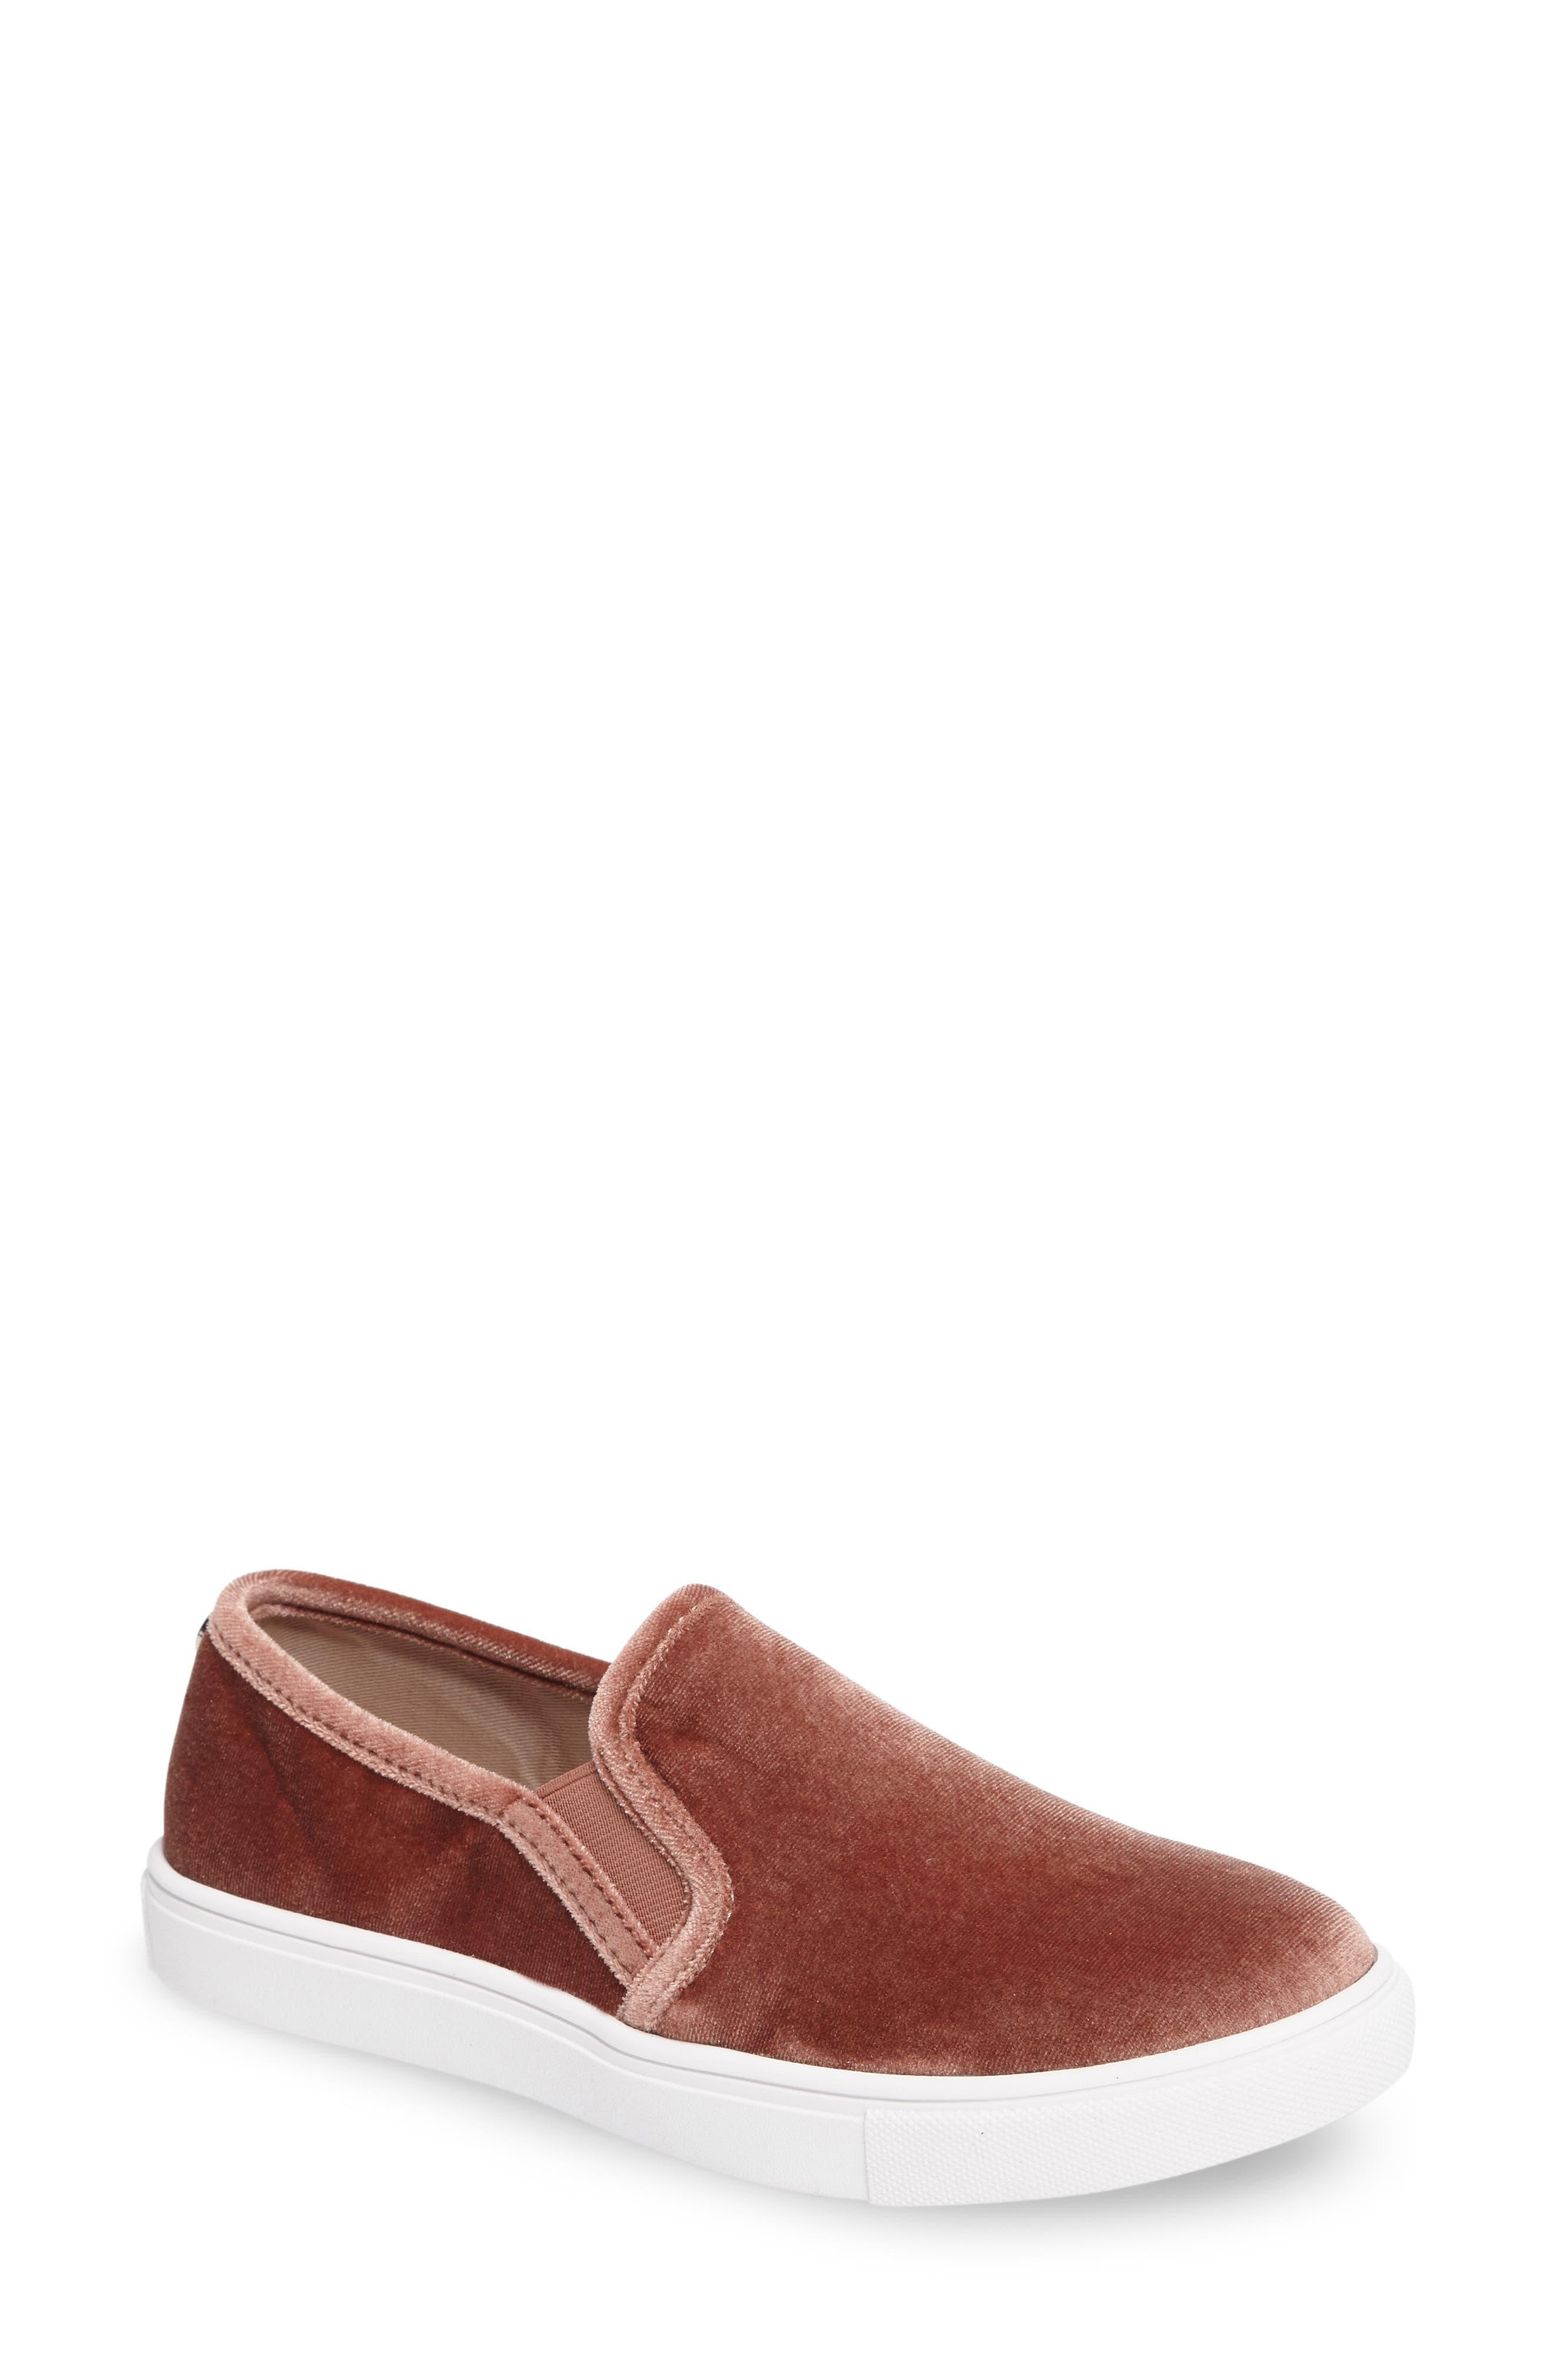 Ecntrcv Slip-On Sneaker,                             Main thumbnail 5, color,